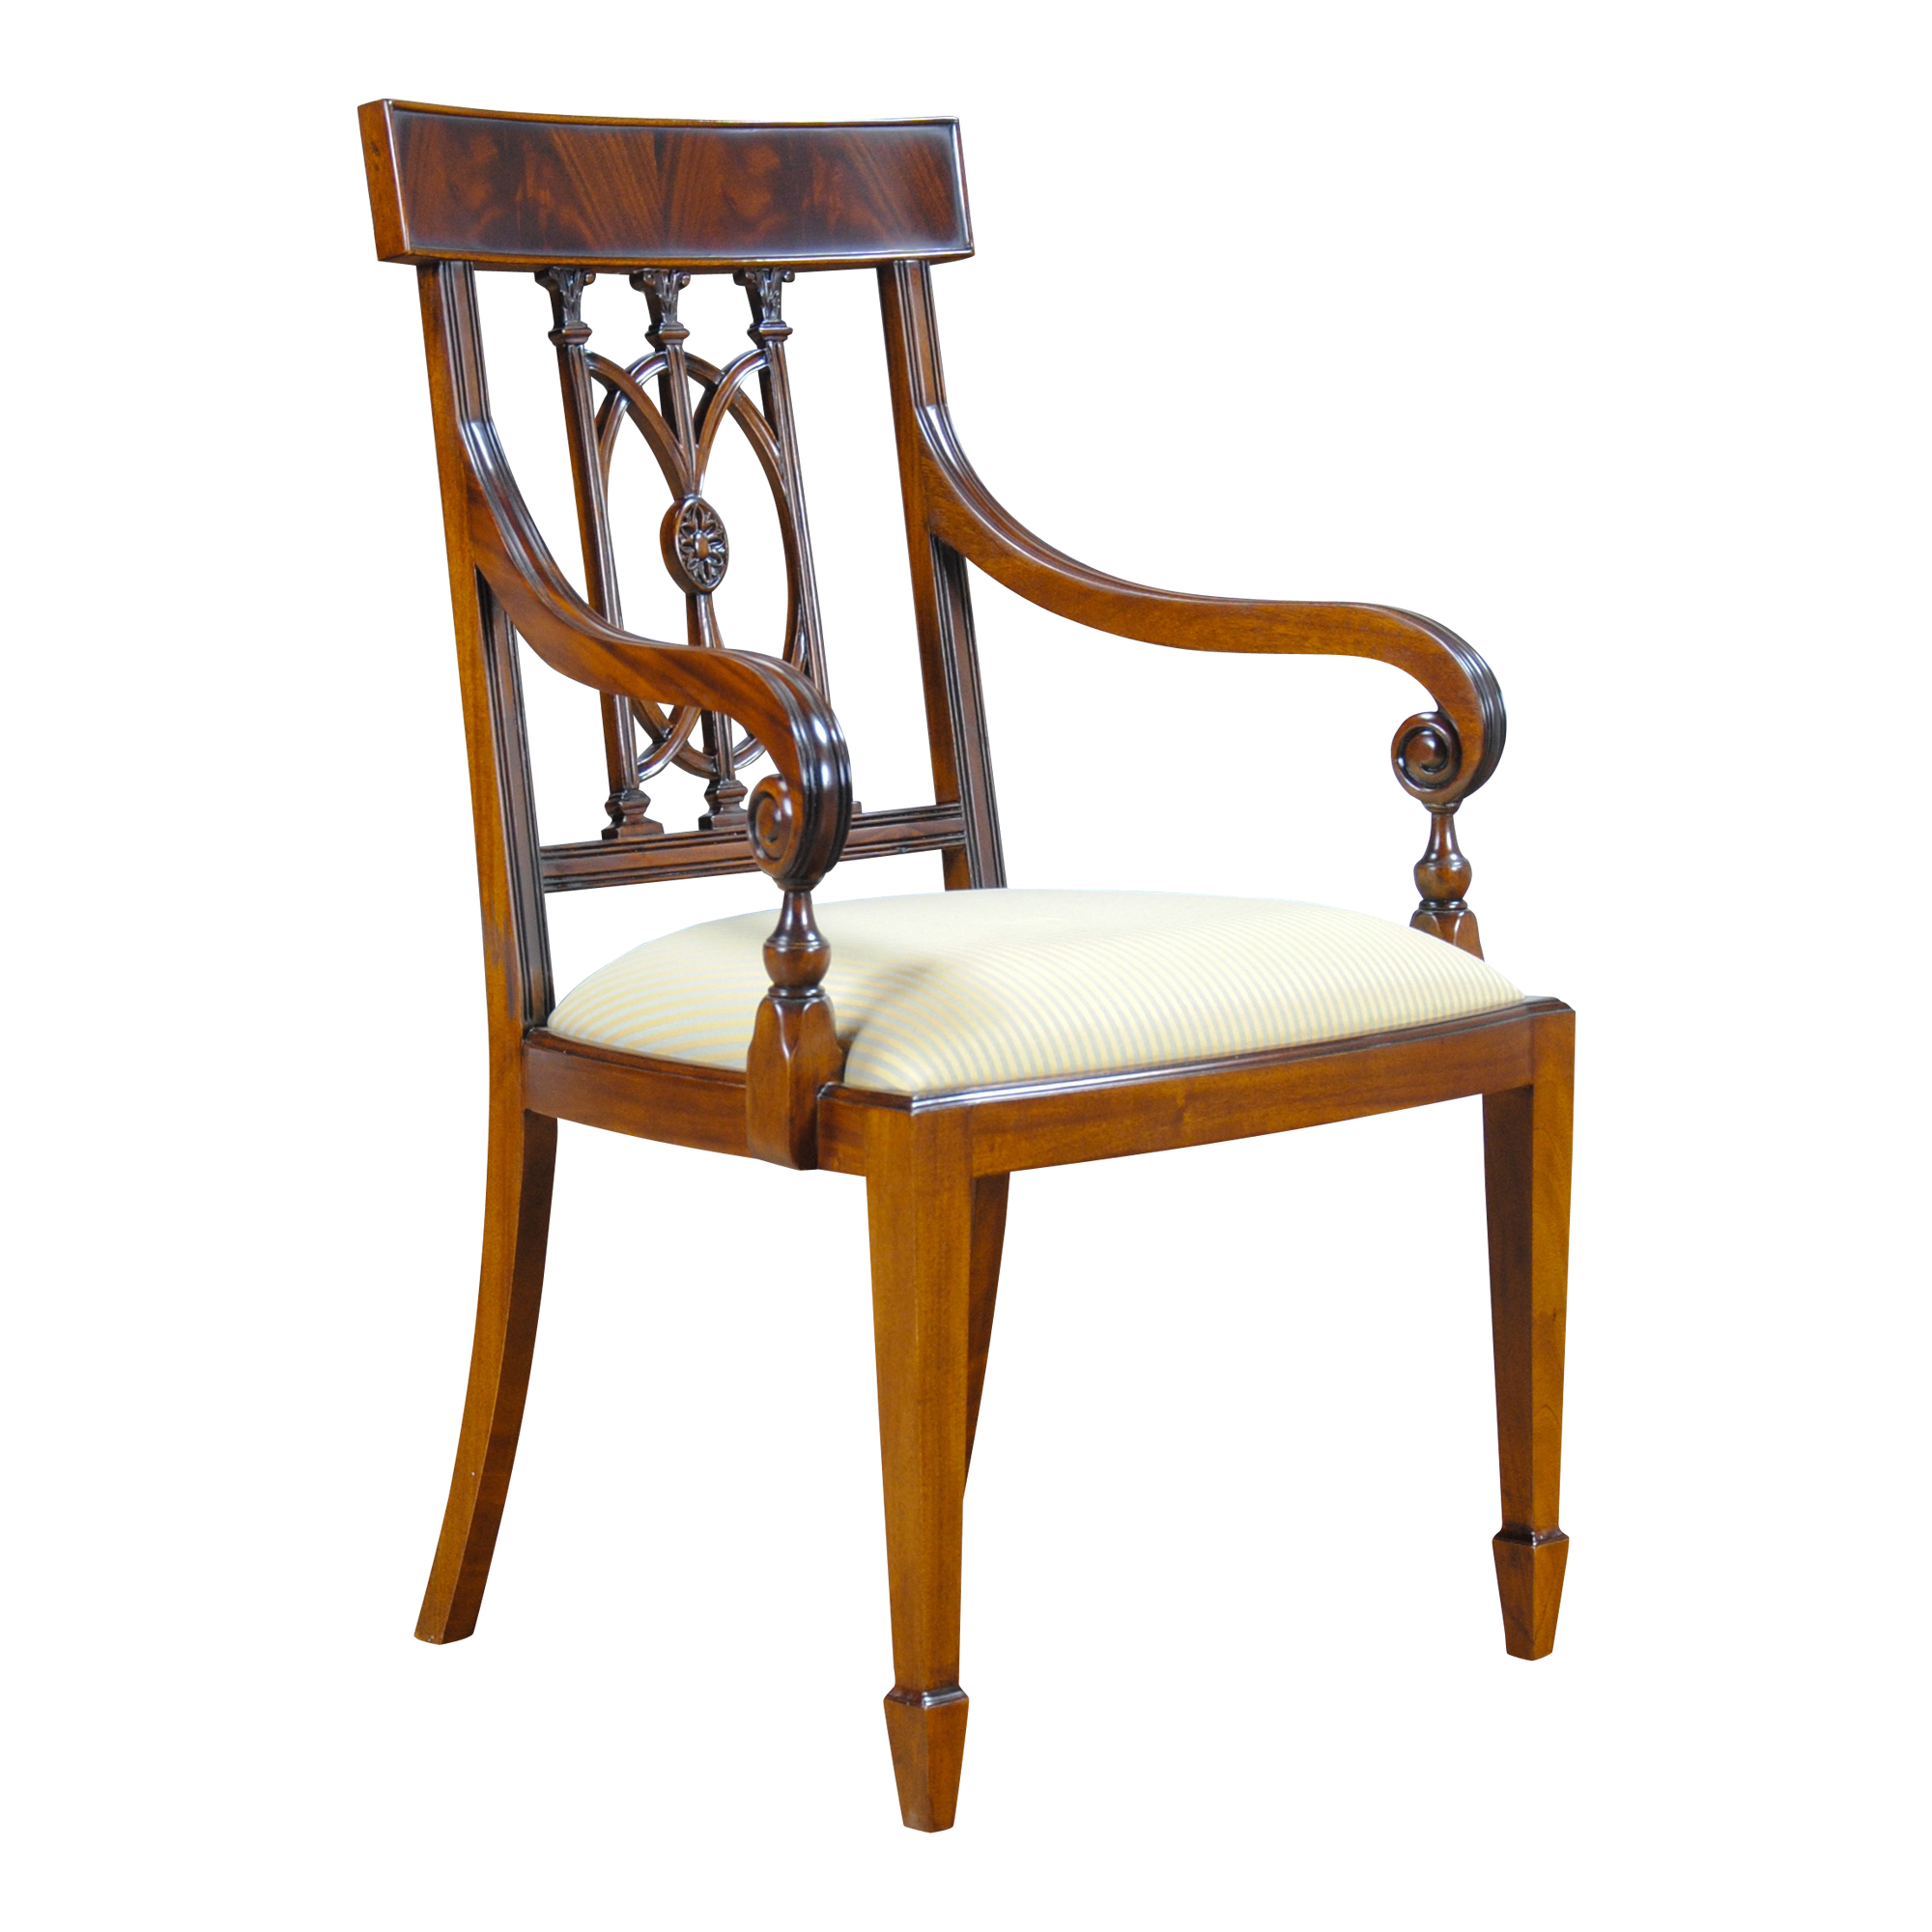 Mahogany Hepplewhite Arm Chair Niagara Furniture free